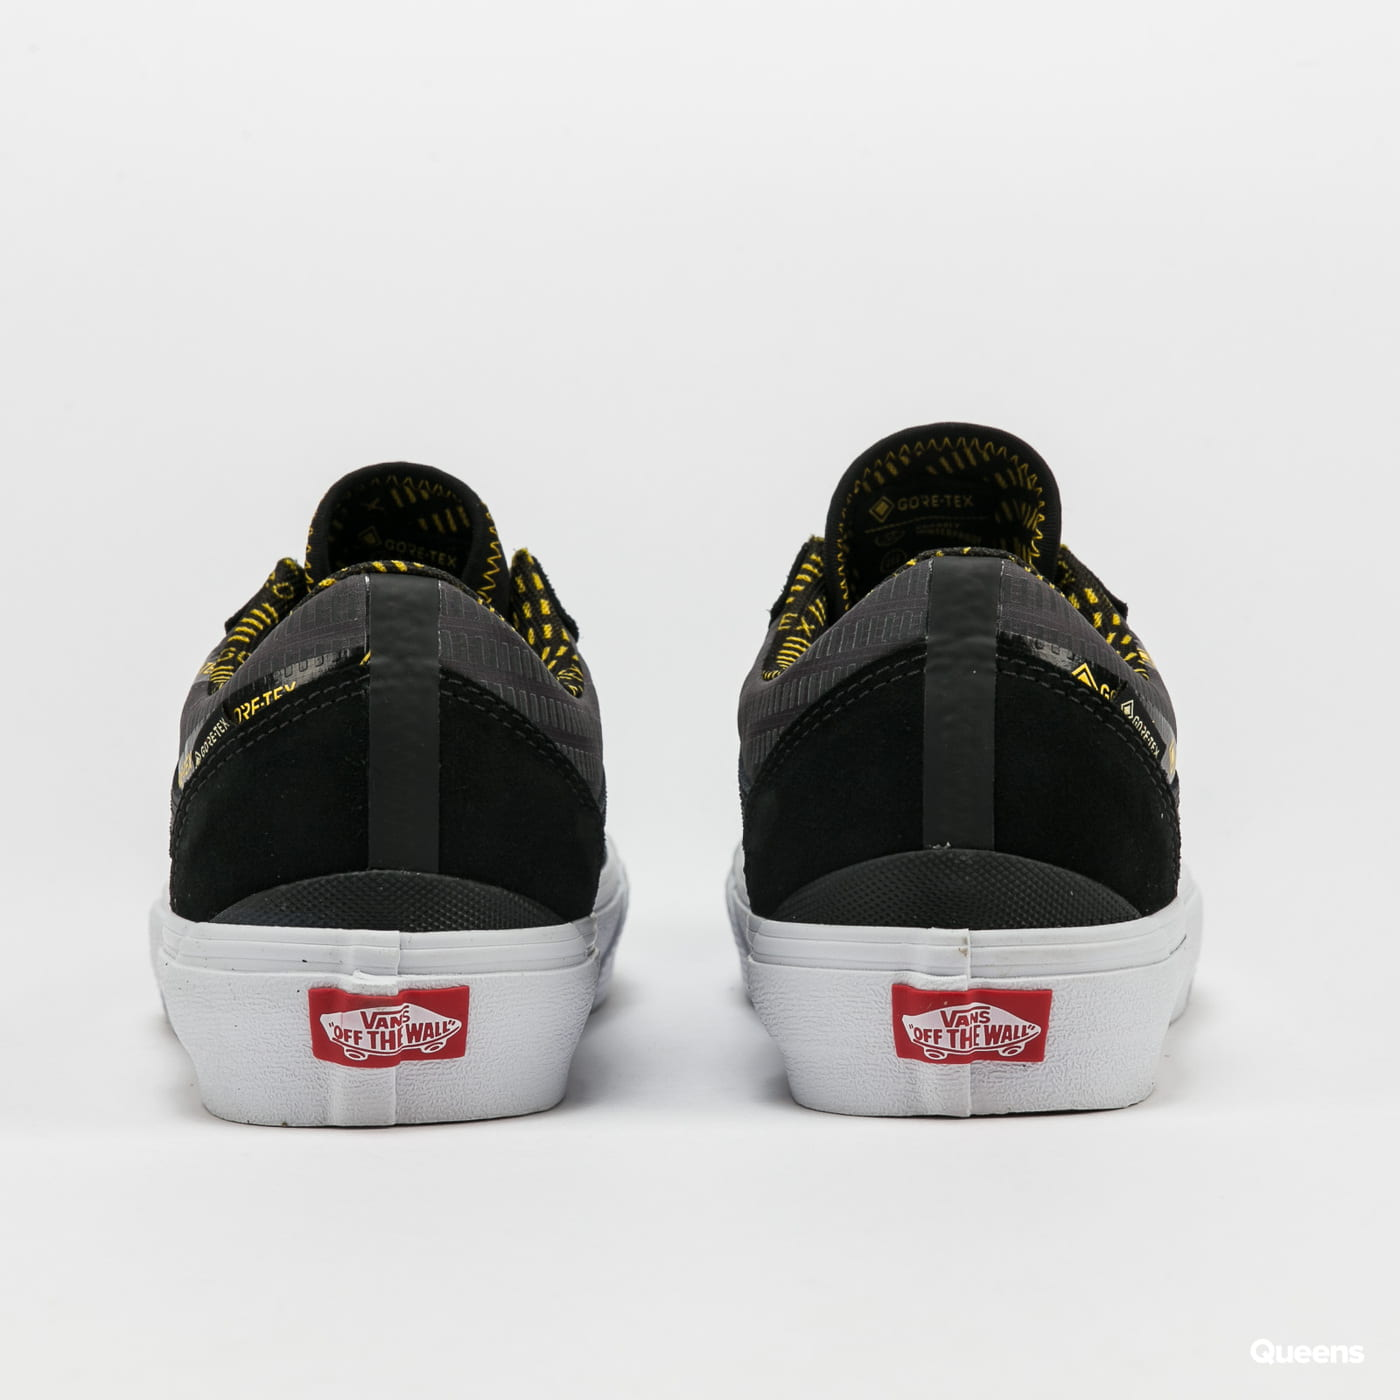 Vans Old Skool Gore-Tex (gore-tex) black / lemon chrome